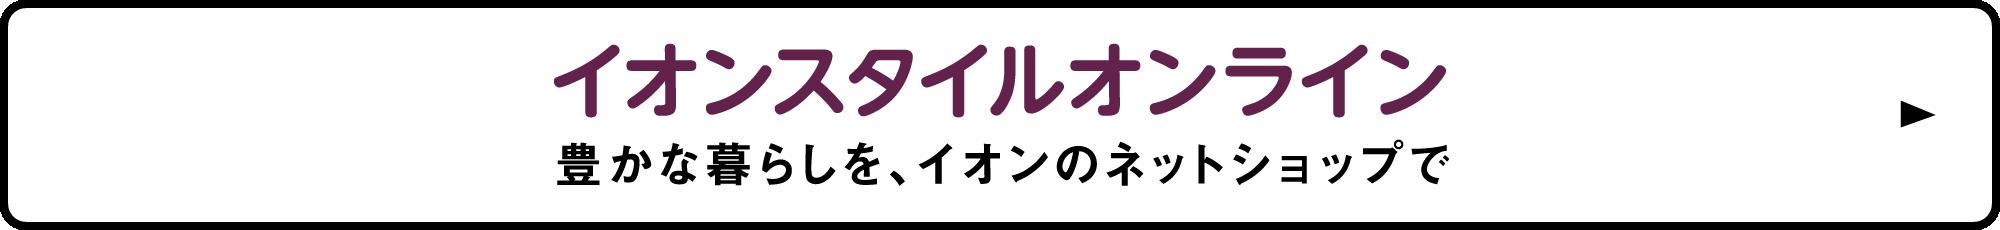 AEON STYLE ONLINE イオンスタイルオンライン